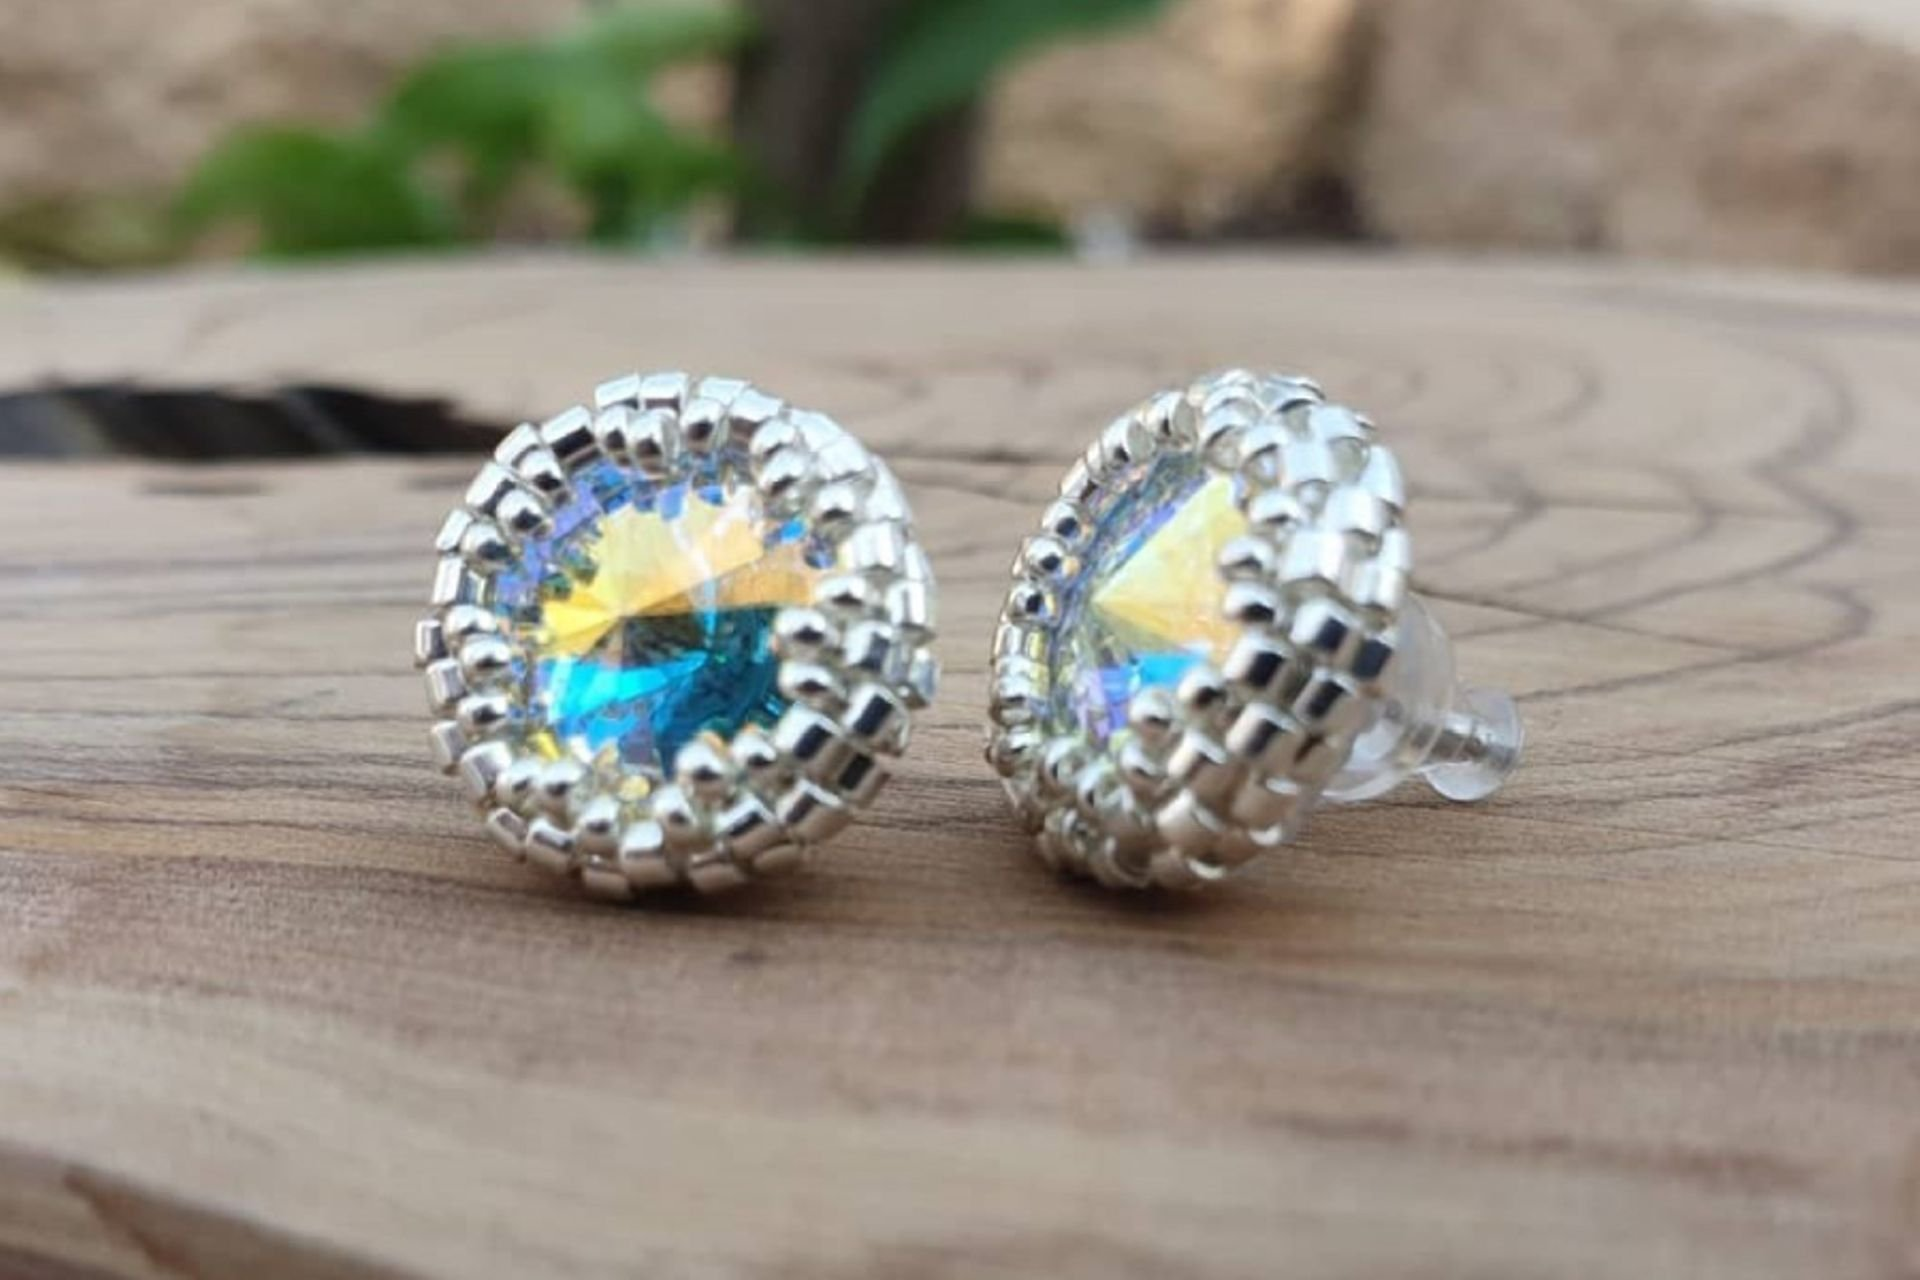 21 lantana beads jewelry designer תְמוּנָה